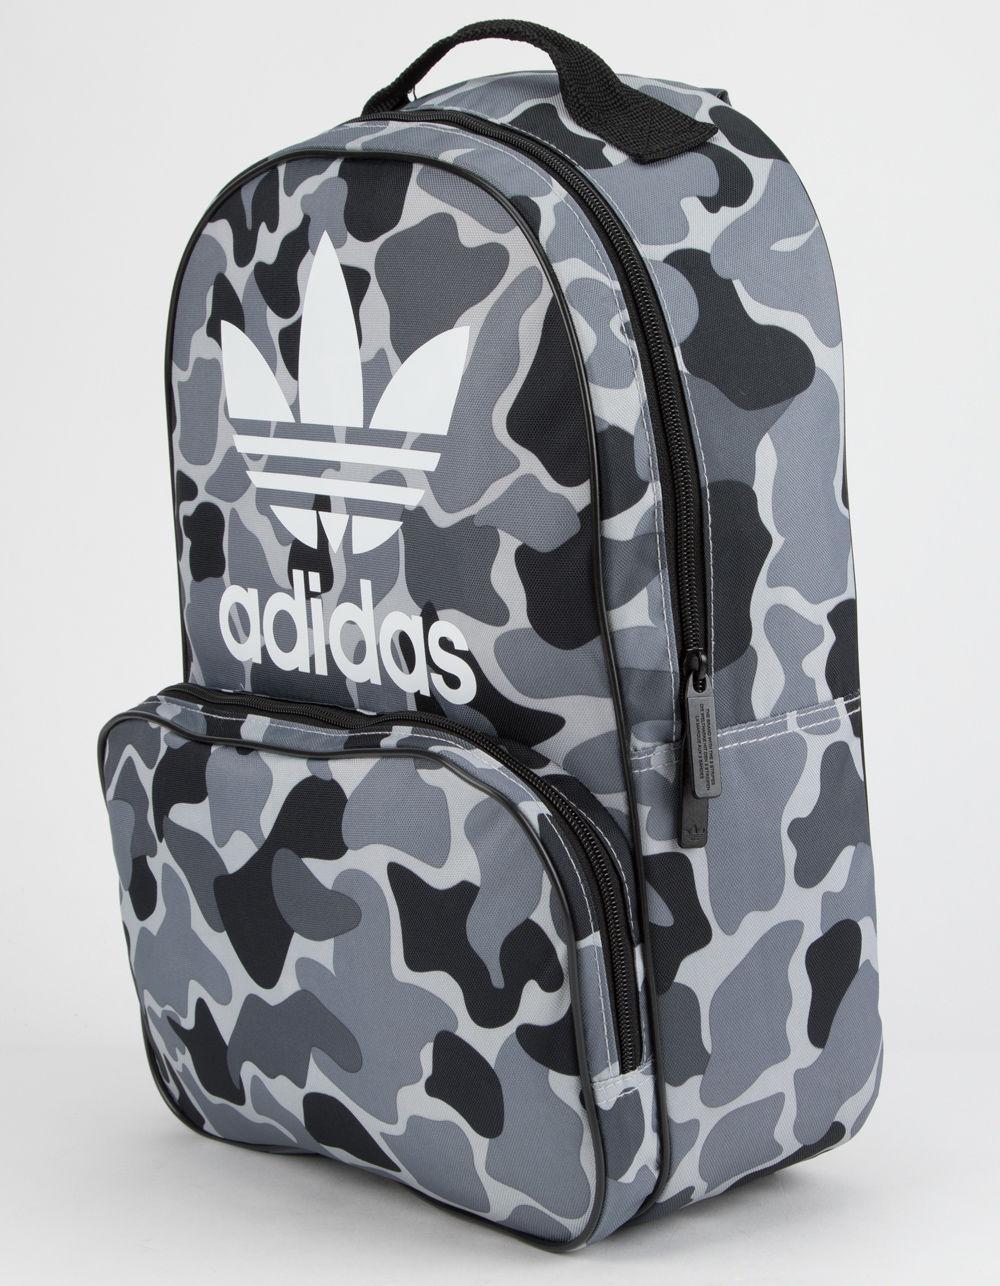 64c7178759f Lyst - adidas Originals Santiago Black Camo Backpack in Black for Men